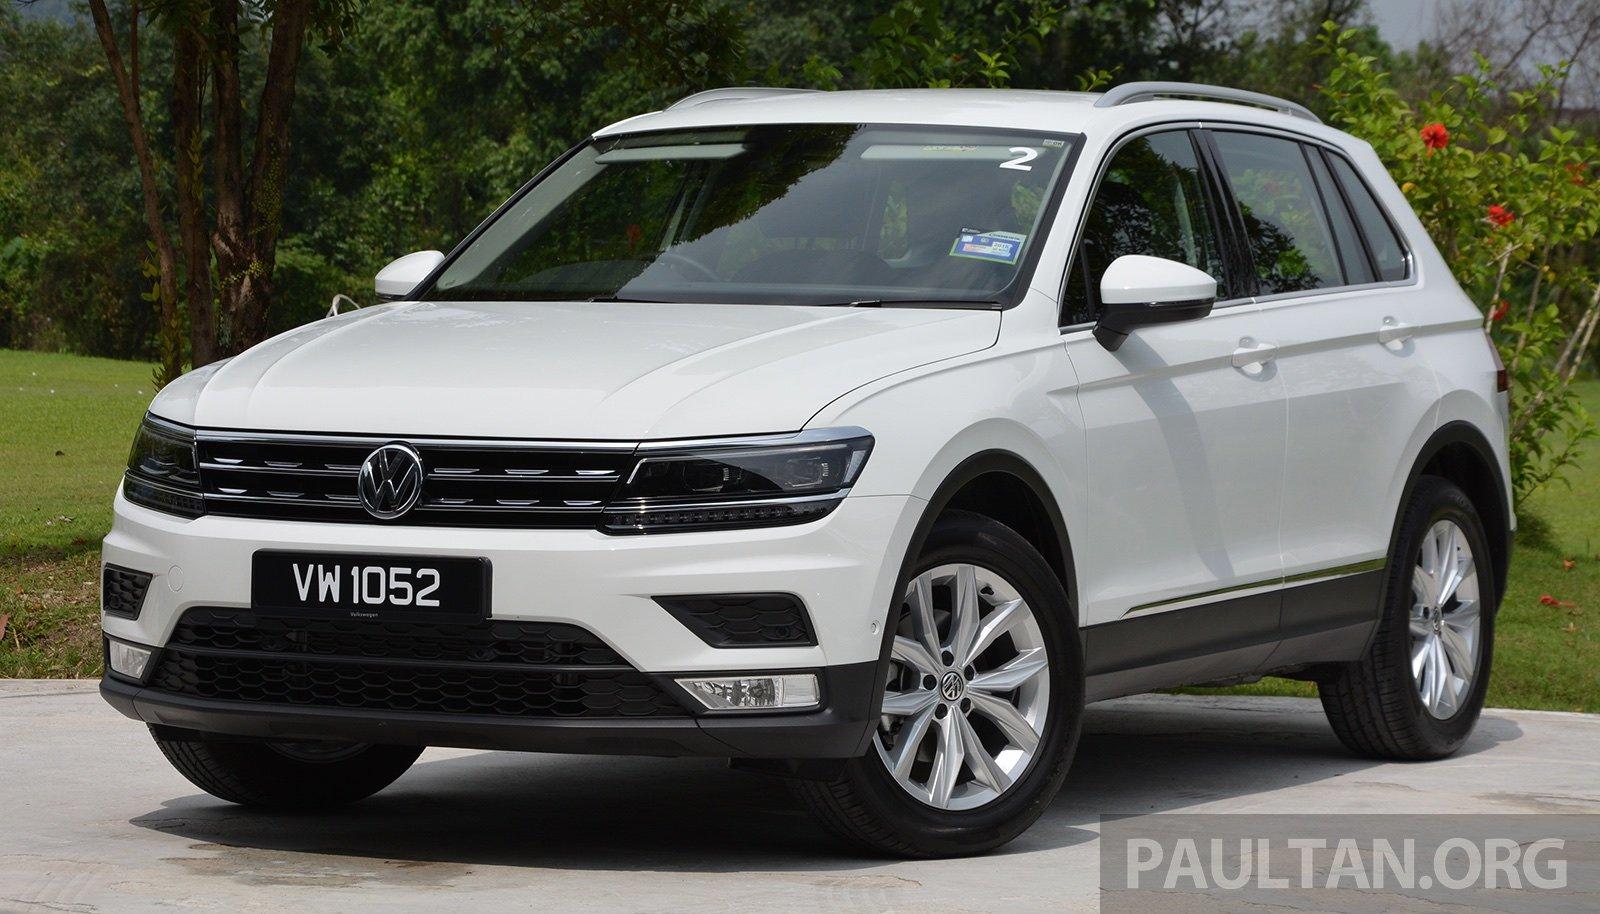 Driven Volkswagen Tiguan Striking Middle Ground Paul